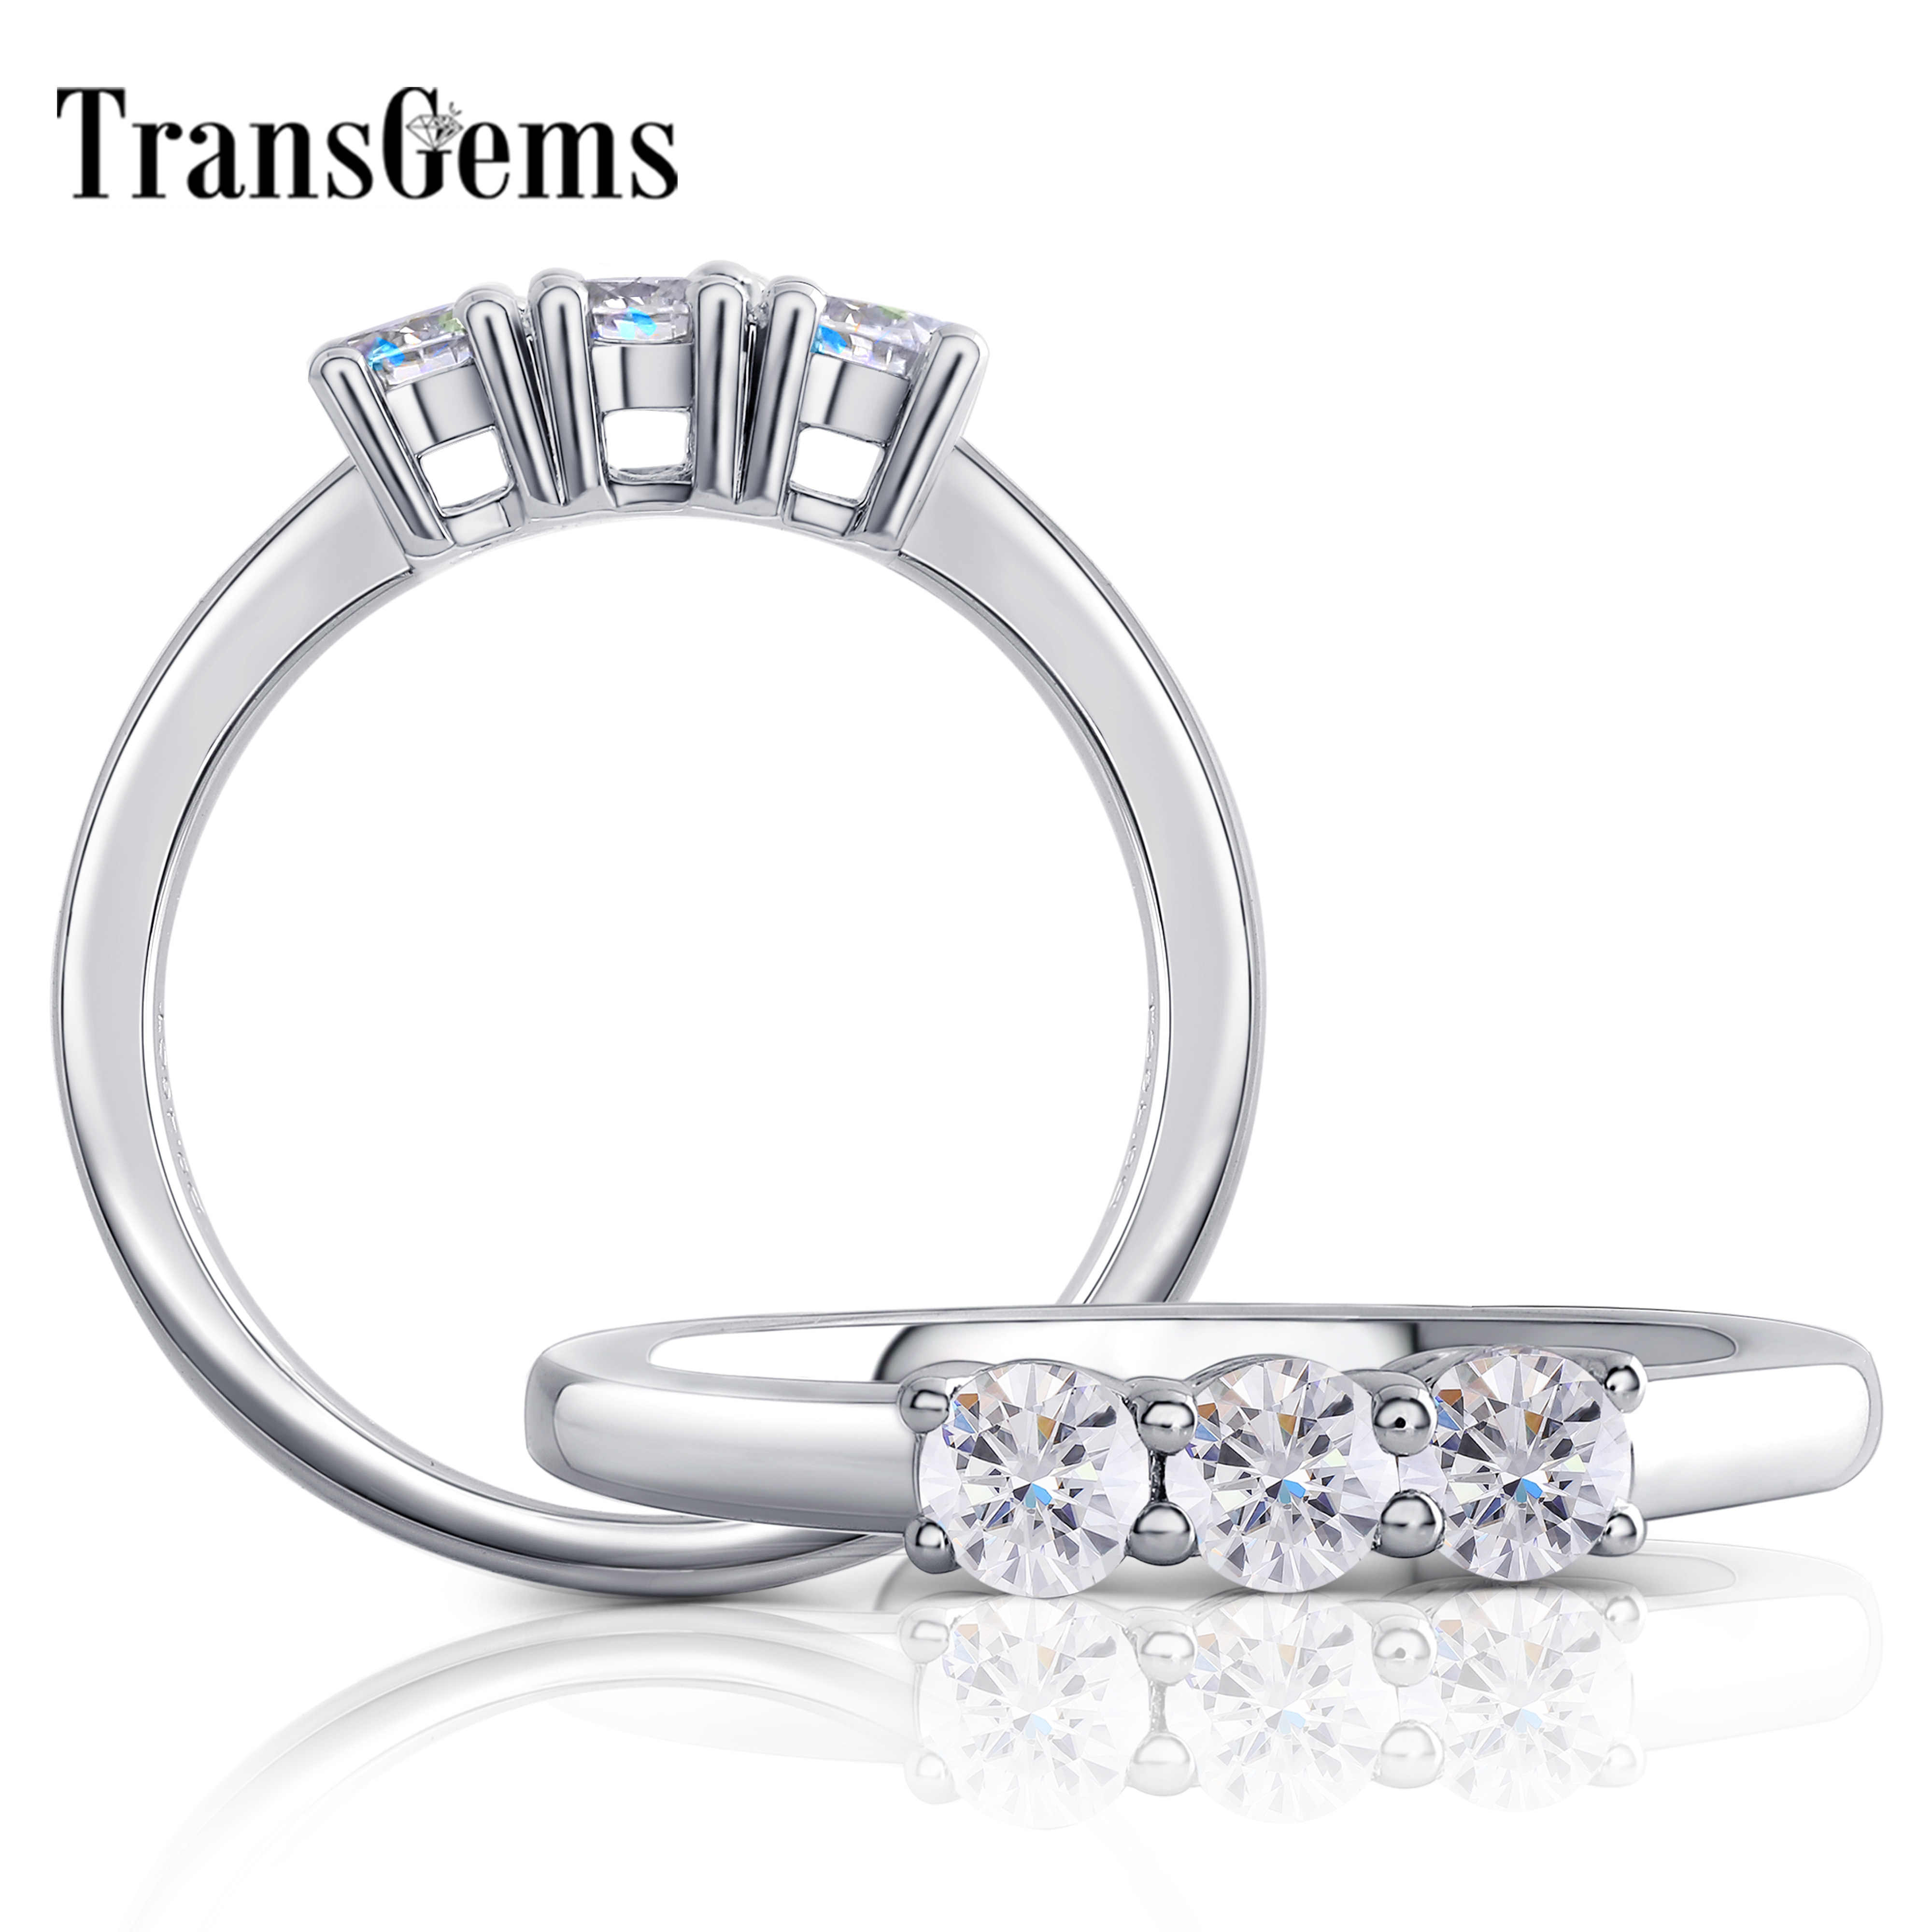 Transgems New ARRIVAL Sterling Silver S925 3.5 มม.G-H-I สี Moissanite แหวนแต่งงานสำหรับผู้หญิงแหวนเงิน